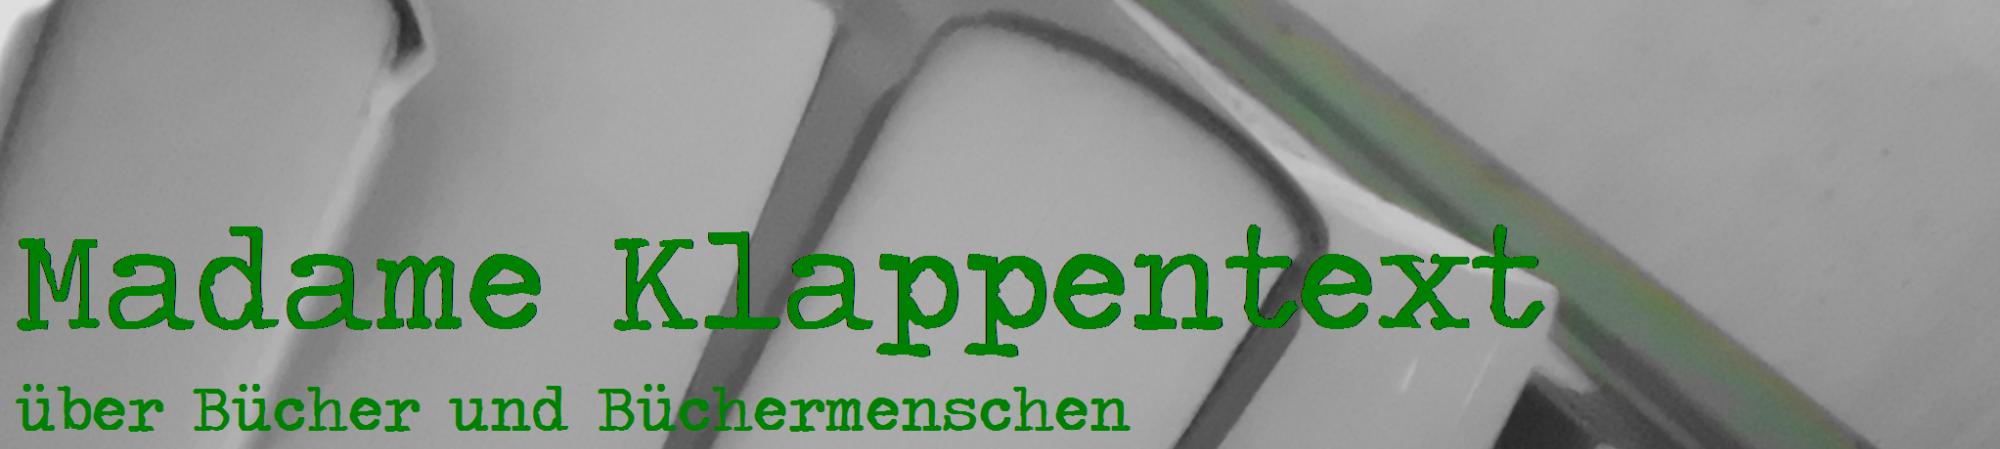 Madame Klappentext